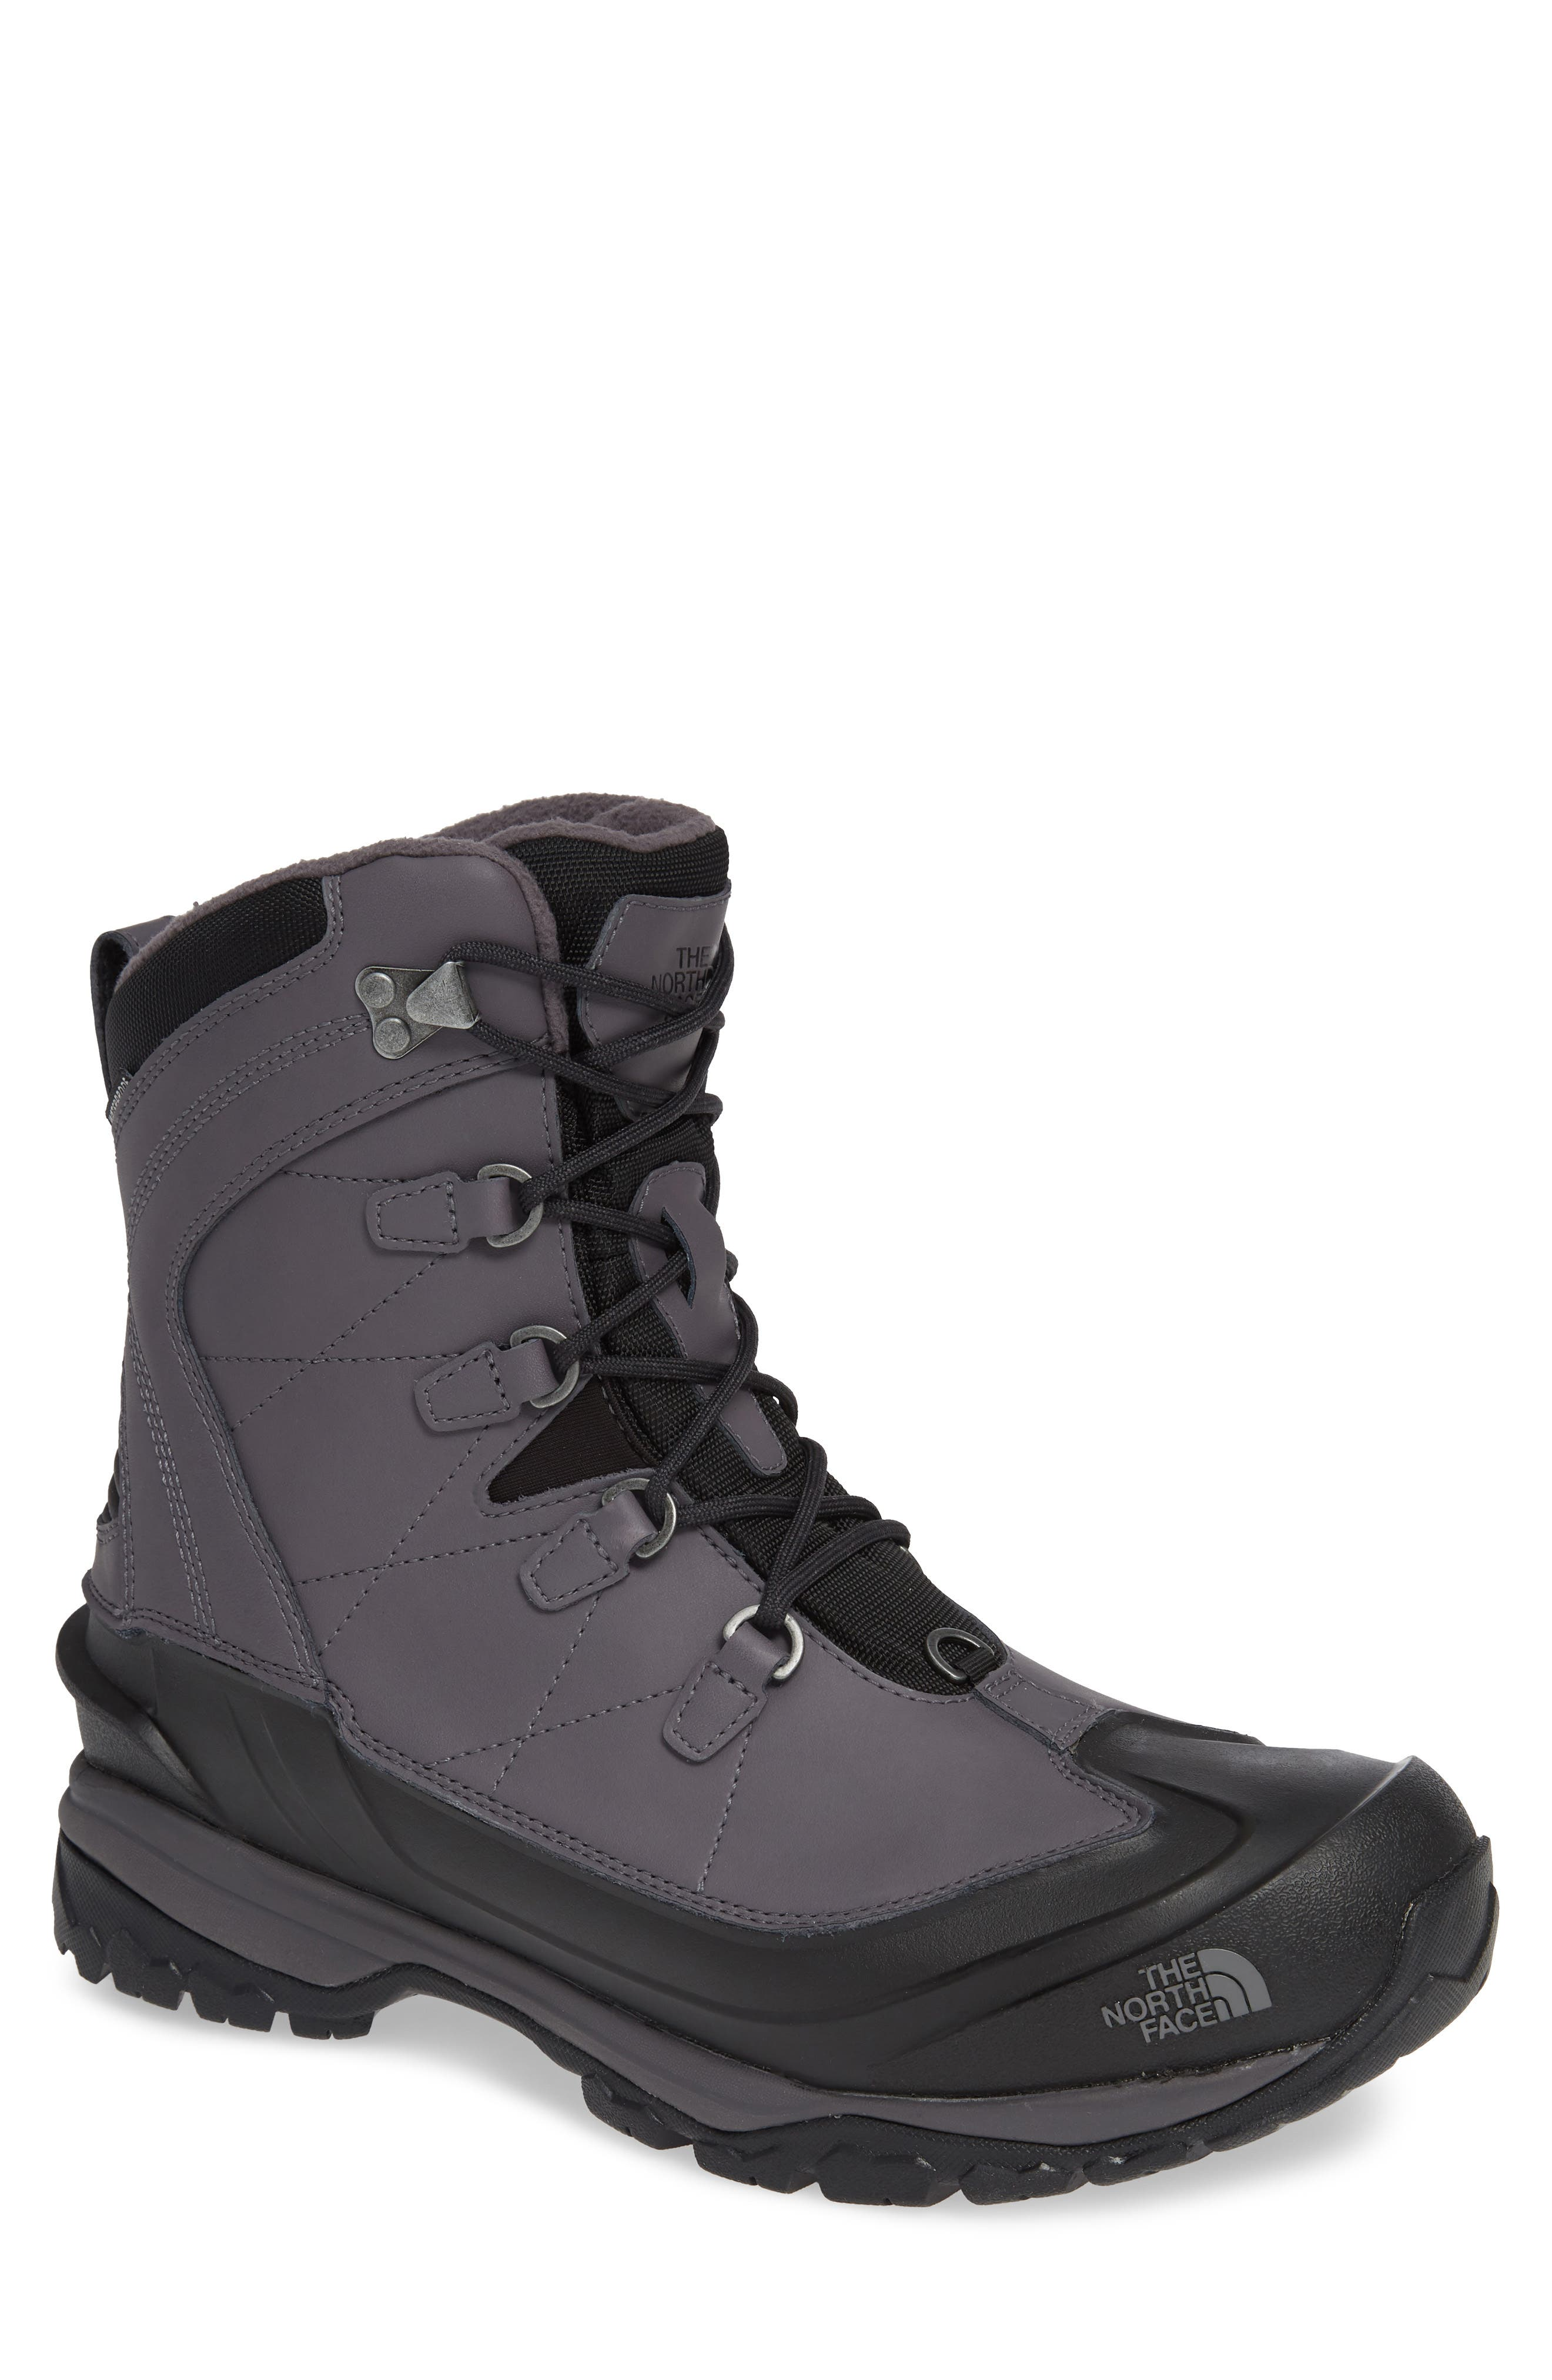 Chilkat Evo Waterproof Insulated Snow Boot,                         Main,                         color, BLACKENED PEARL/ PHANTOM GREY